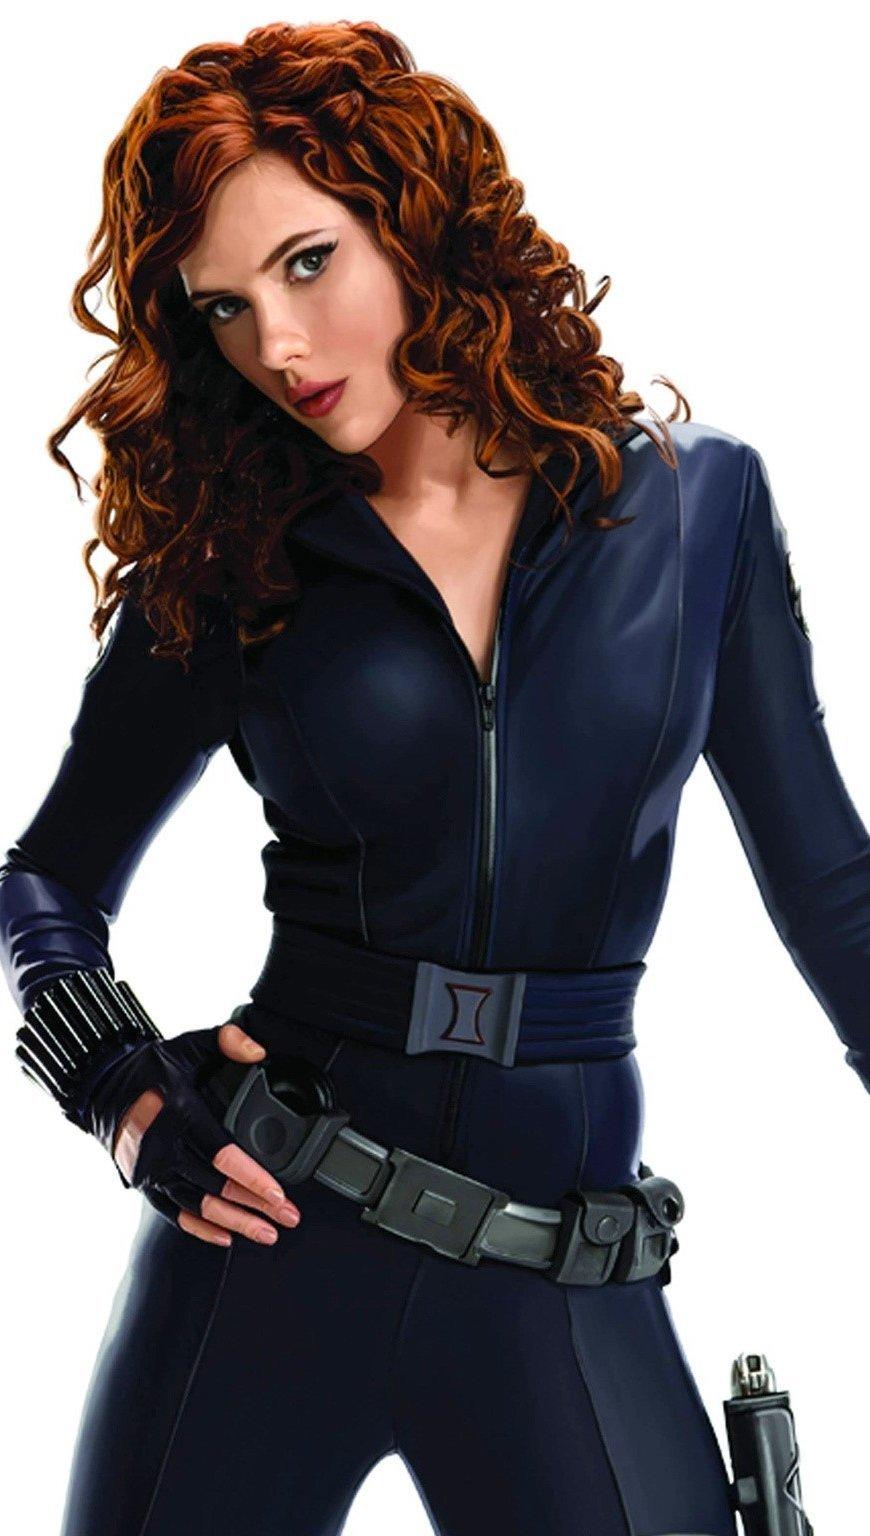 Fondos de pantalla Scarlett Johansson como Black Widow Vertical